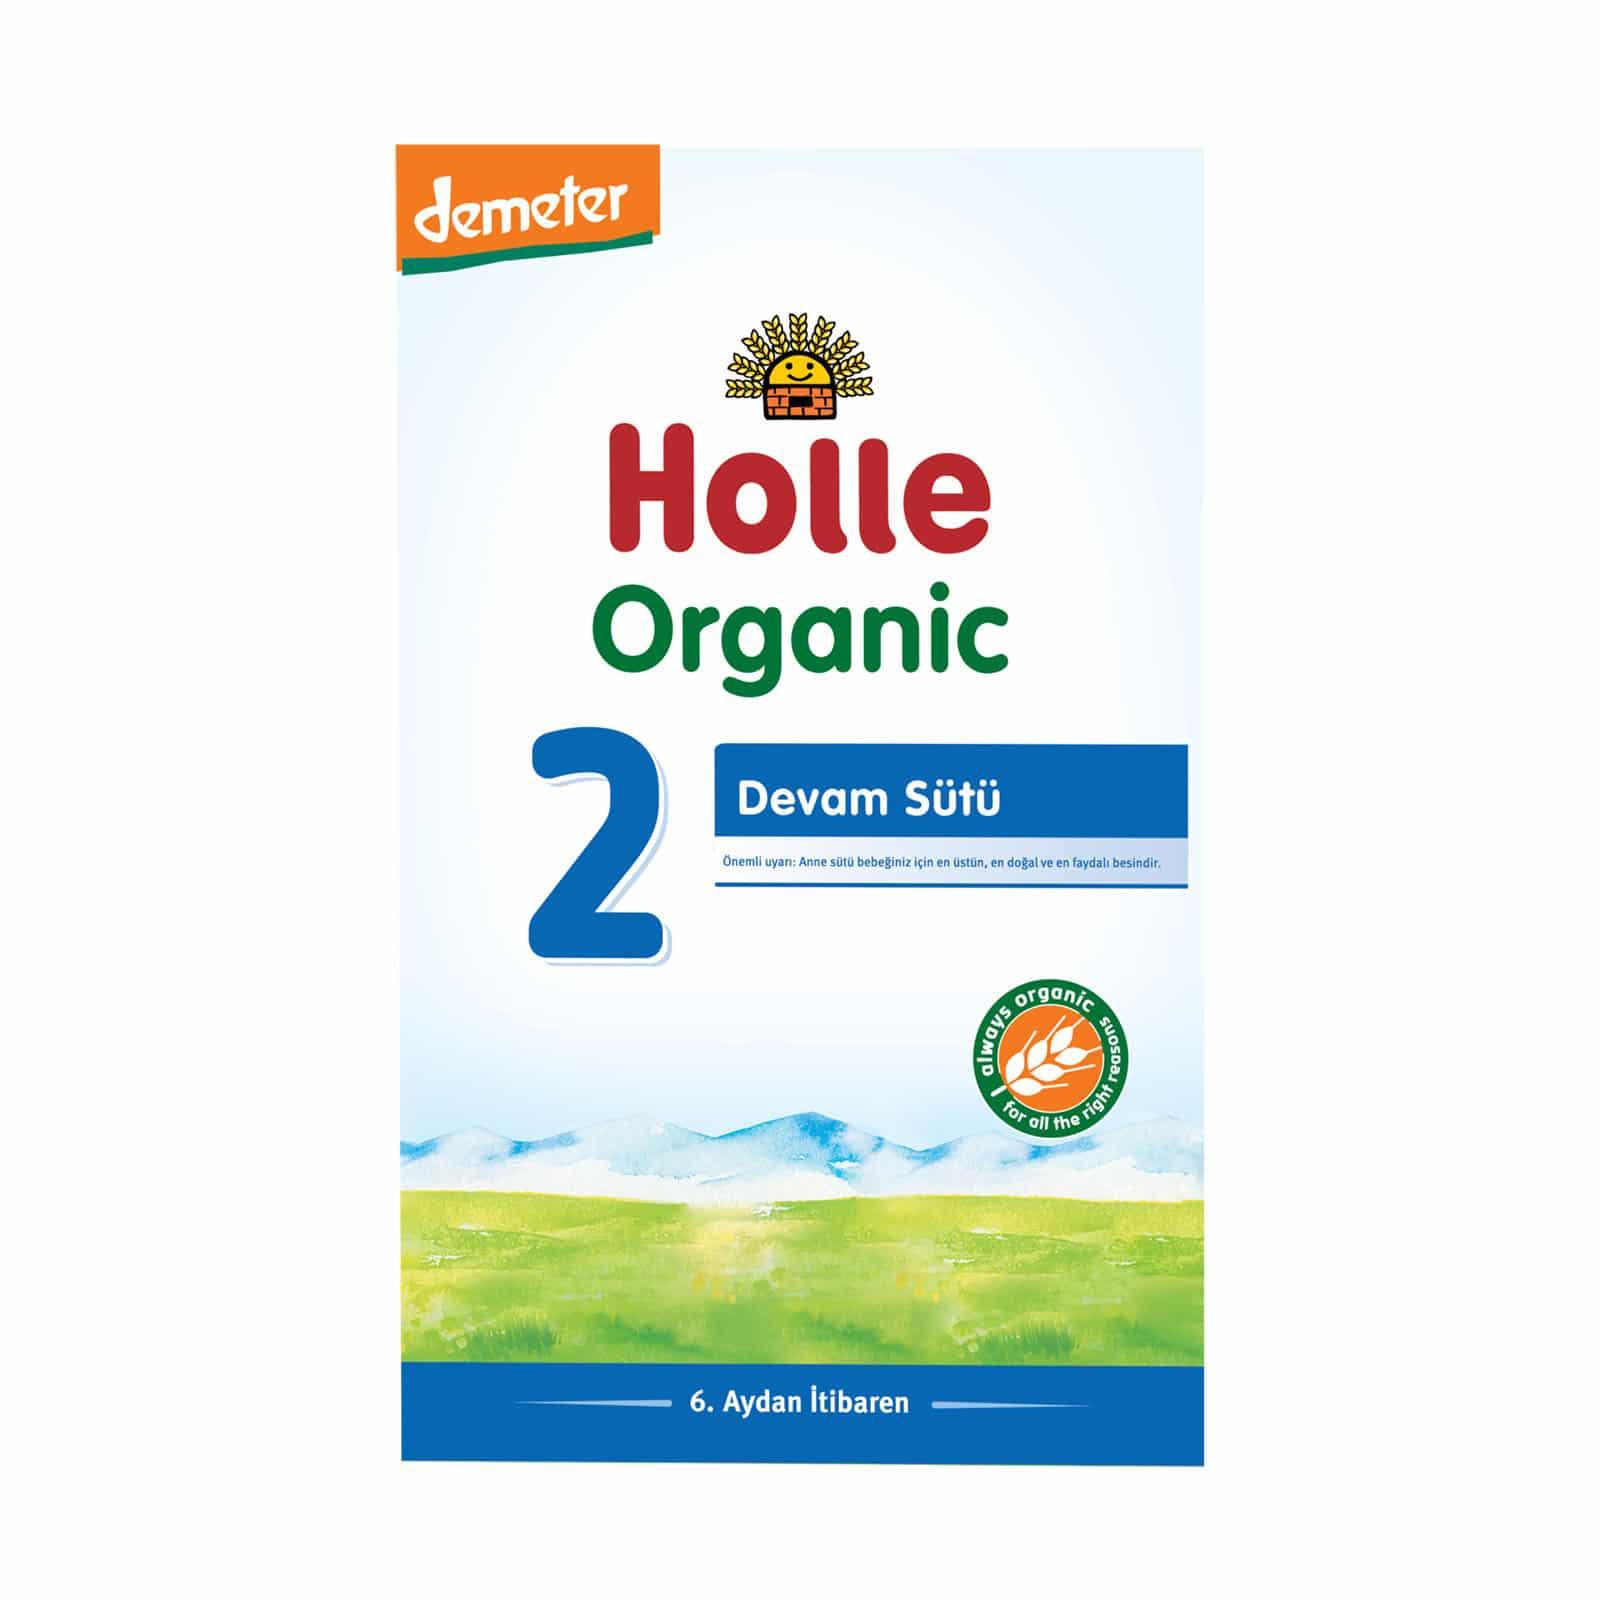 Holle Organik Devam Sütü